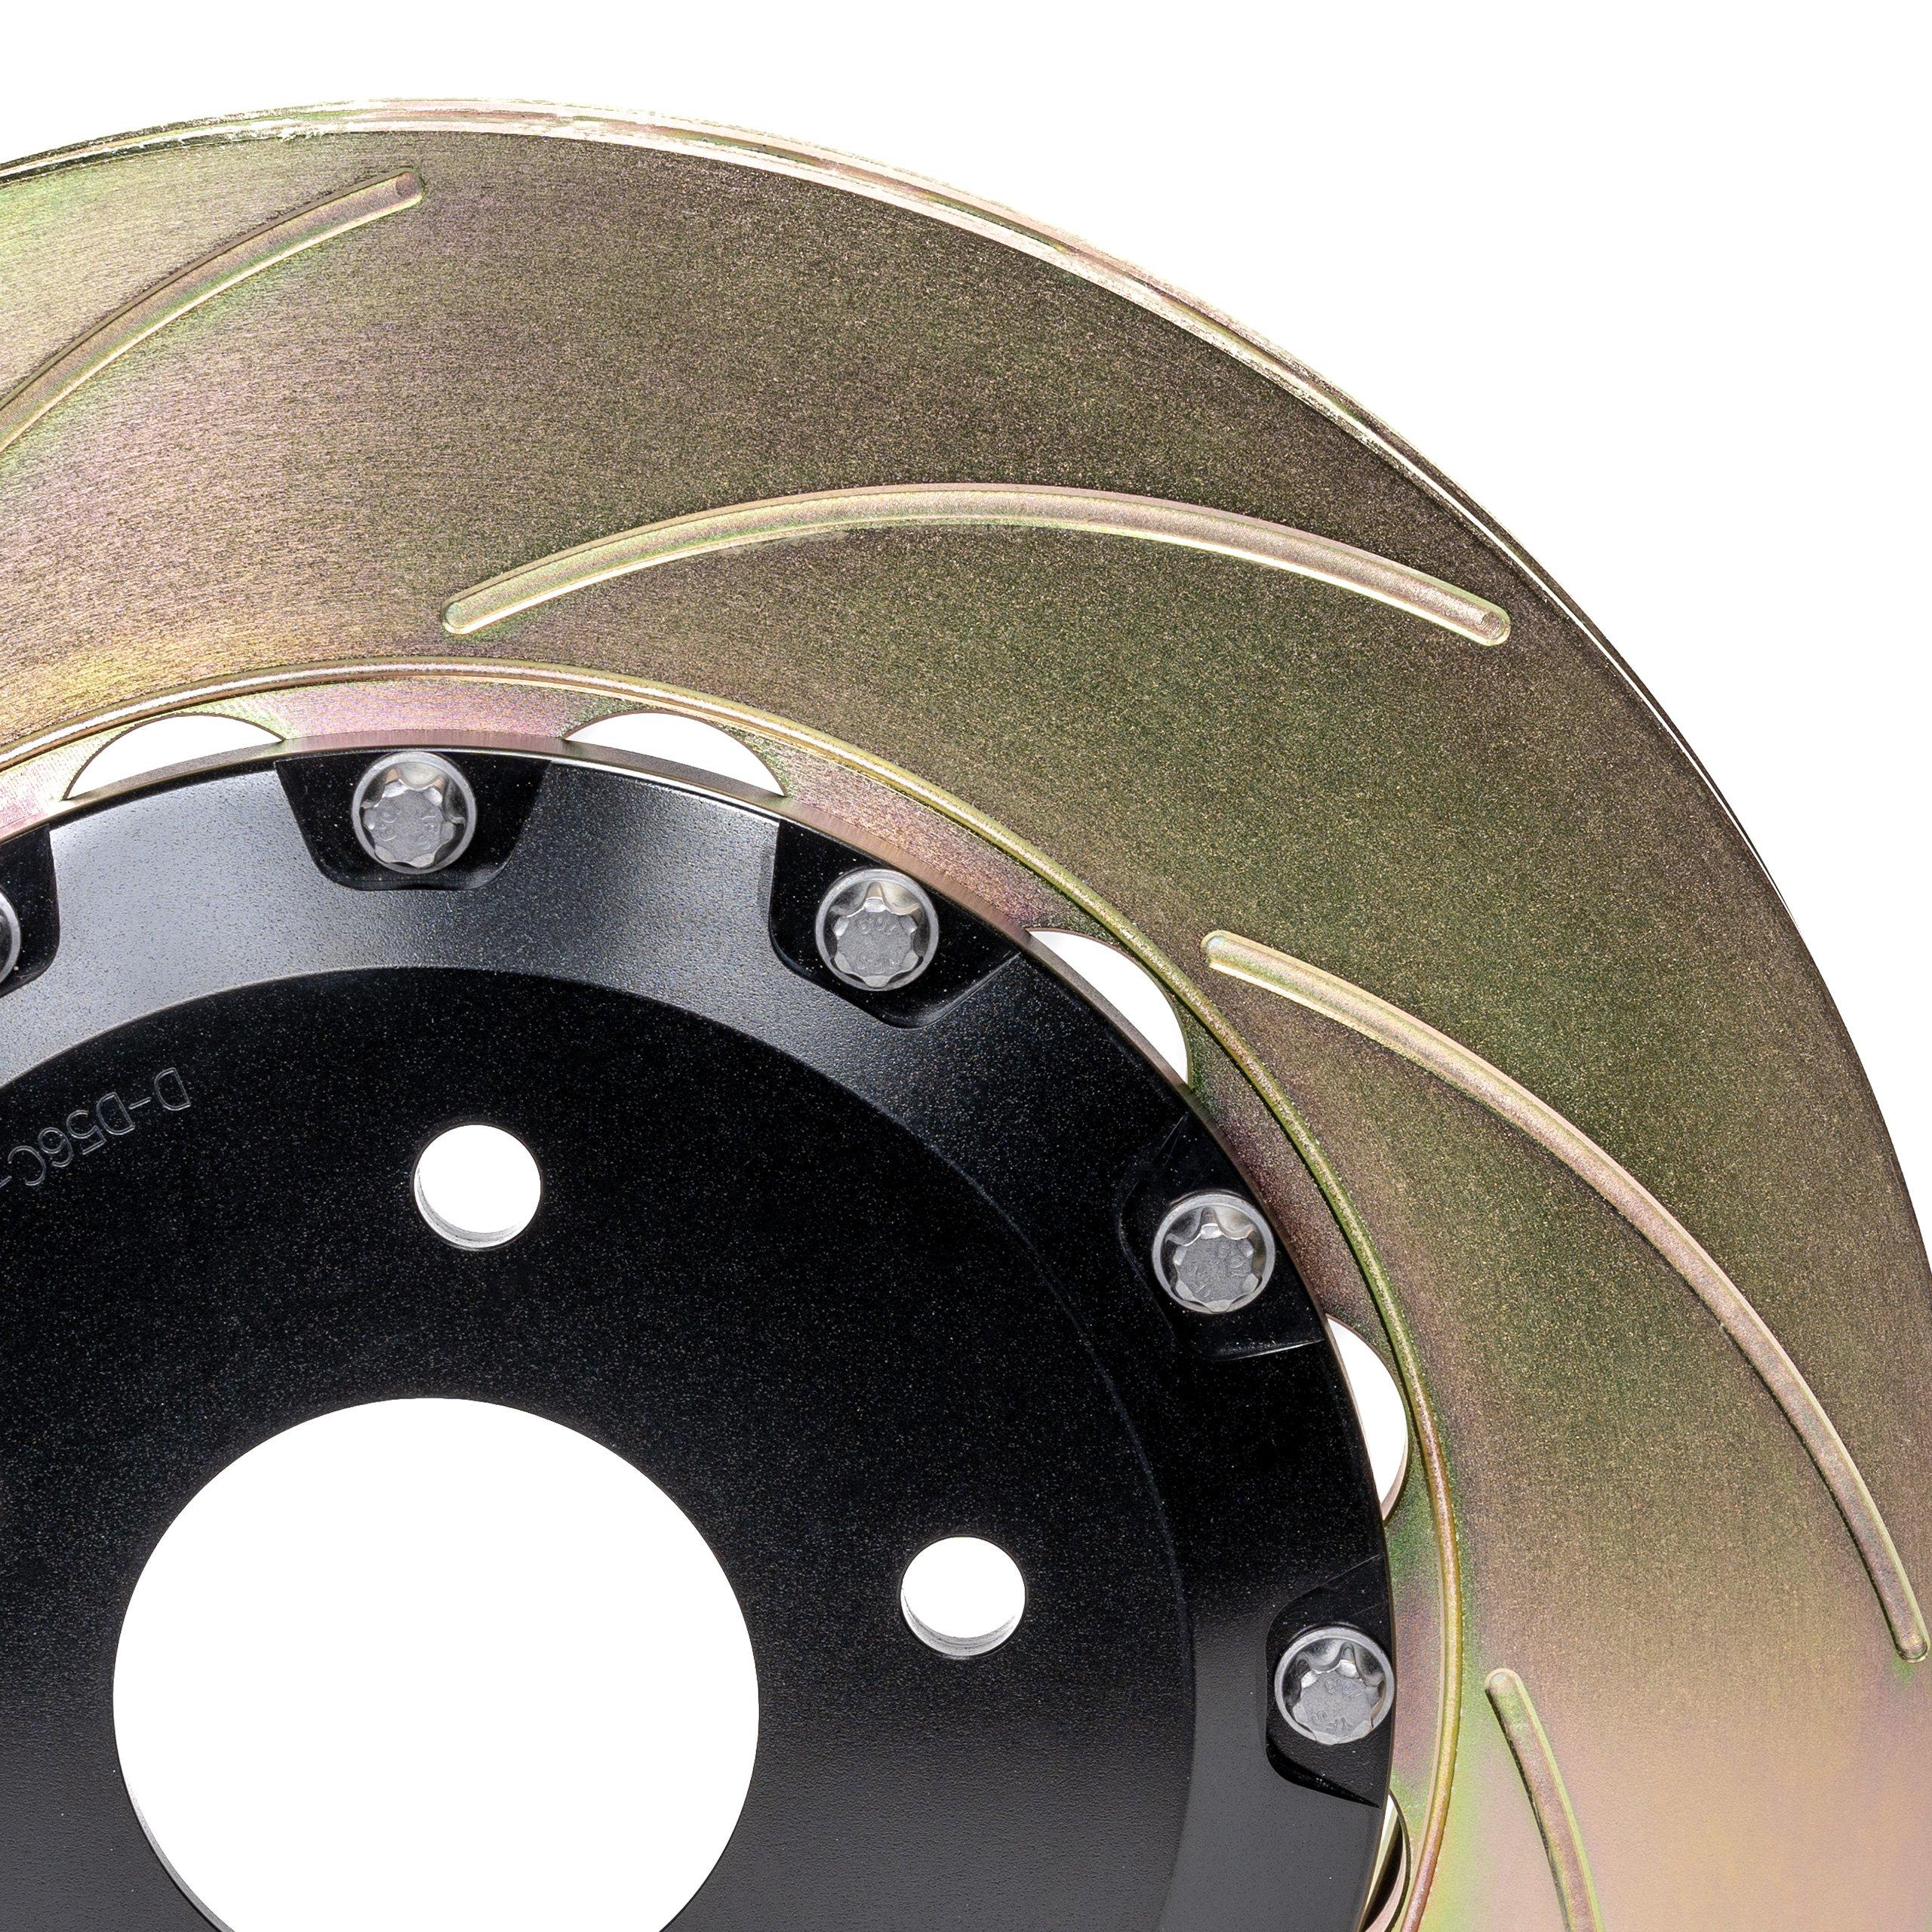 slotted-rotor-close-up